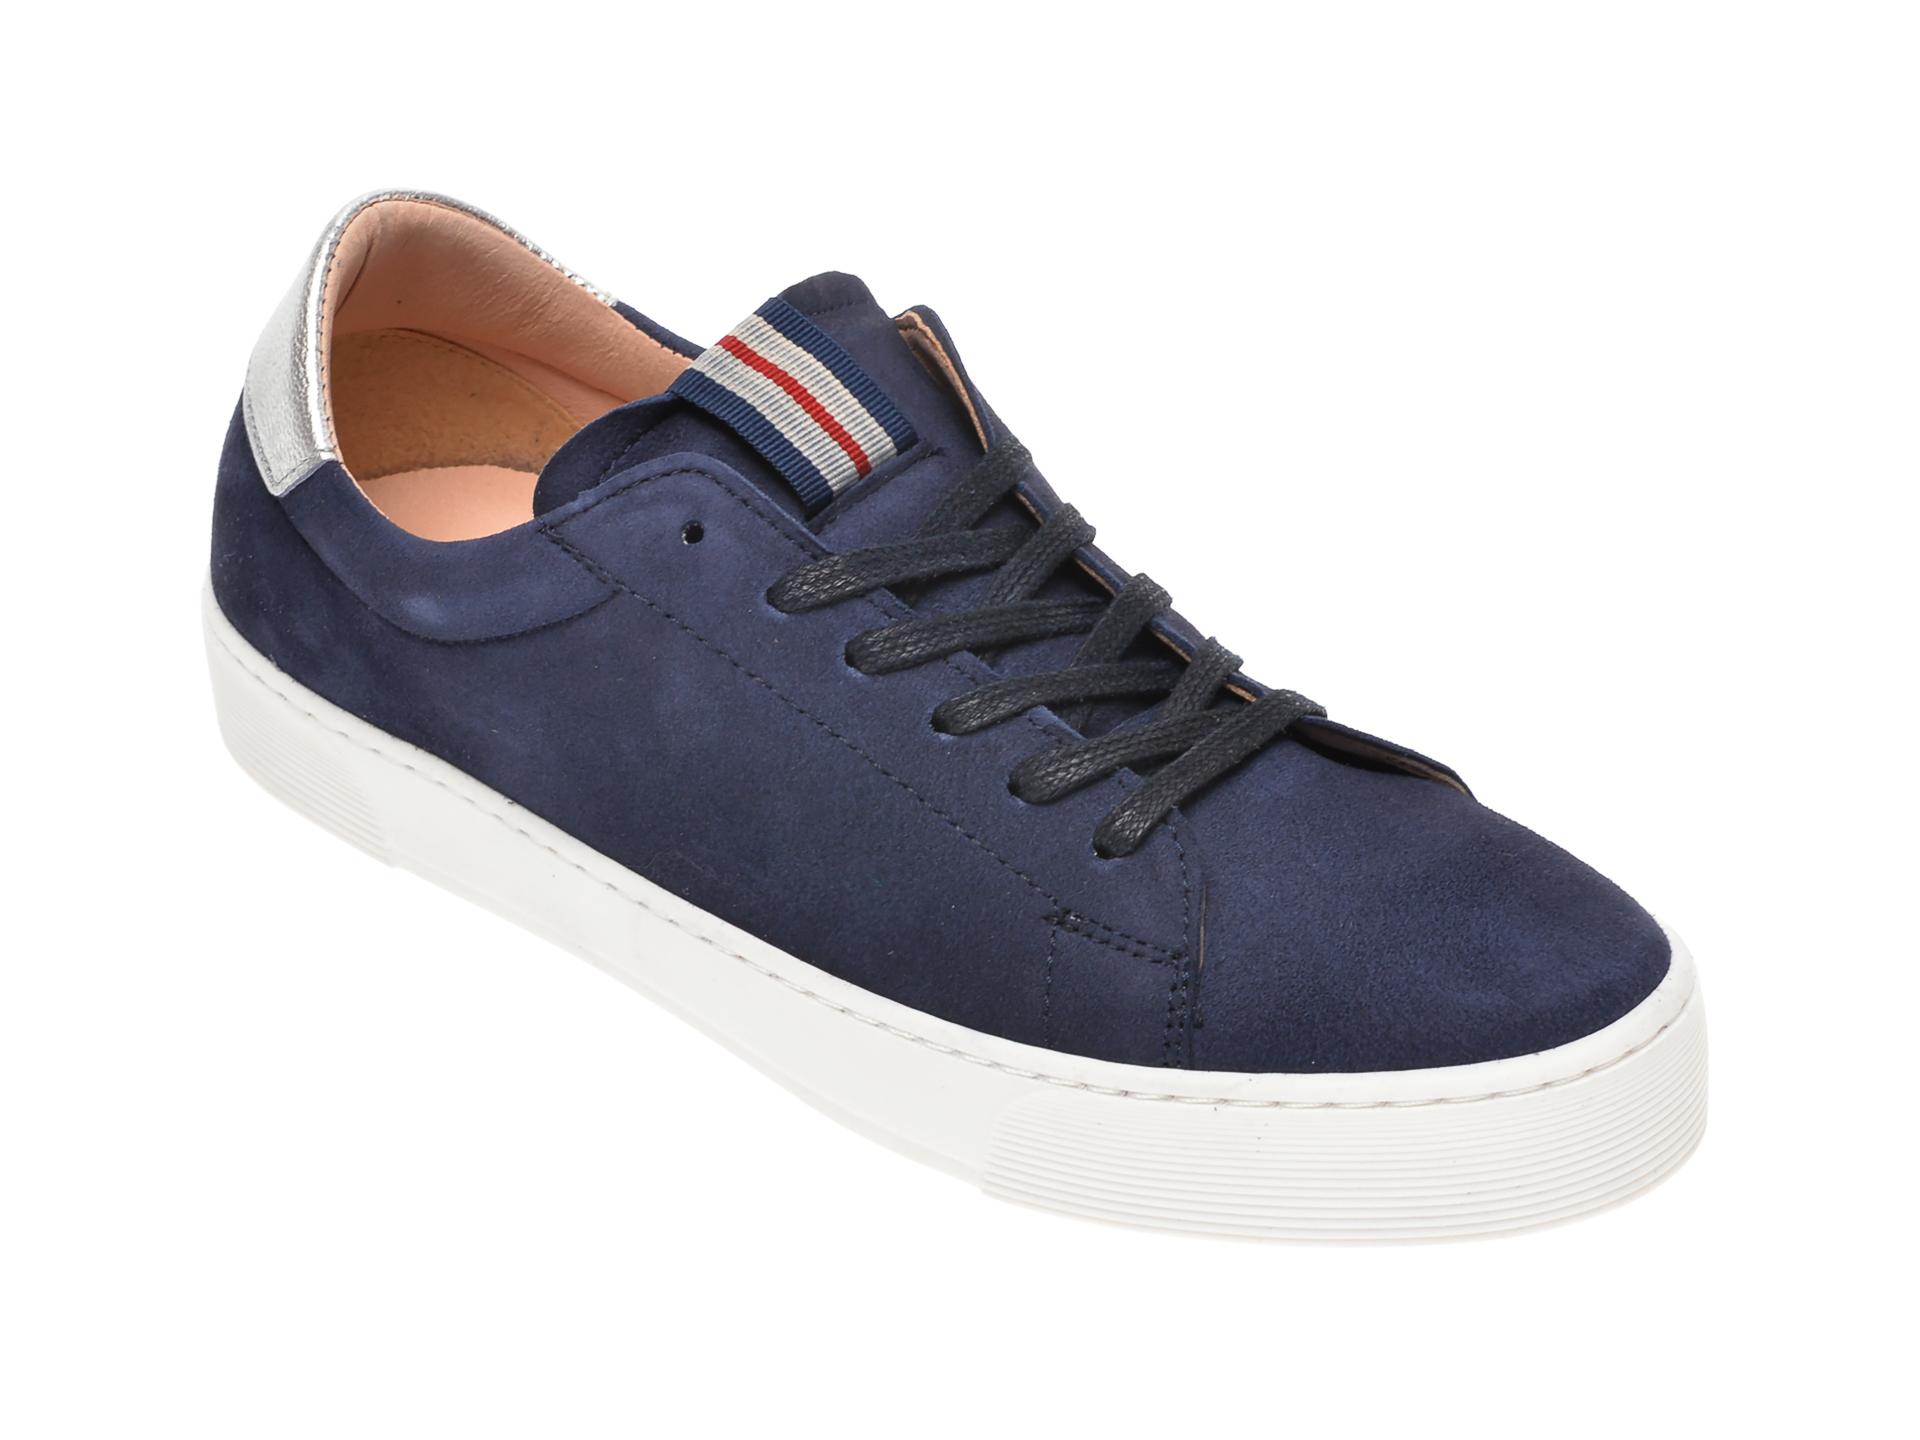 Pantofi sport SALAMANDER bleumarin, 55301, din piele intoarsa